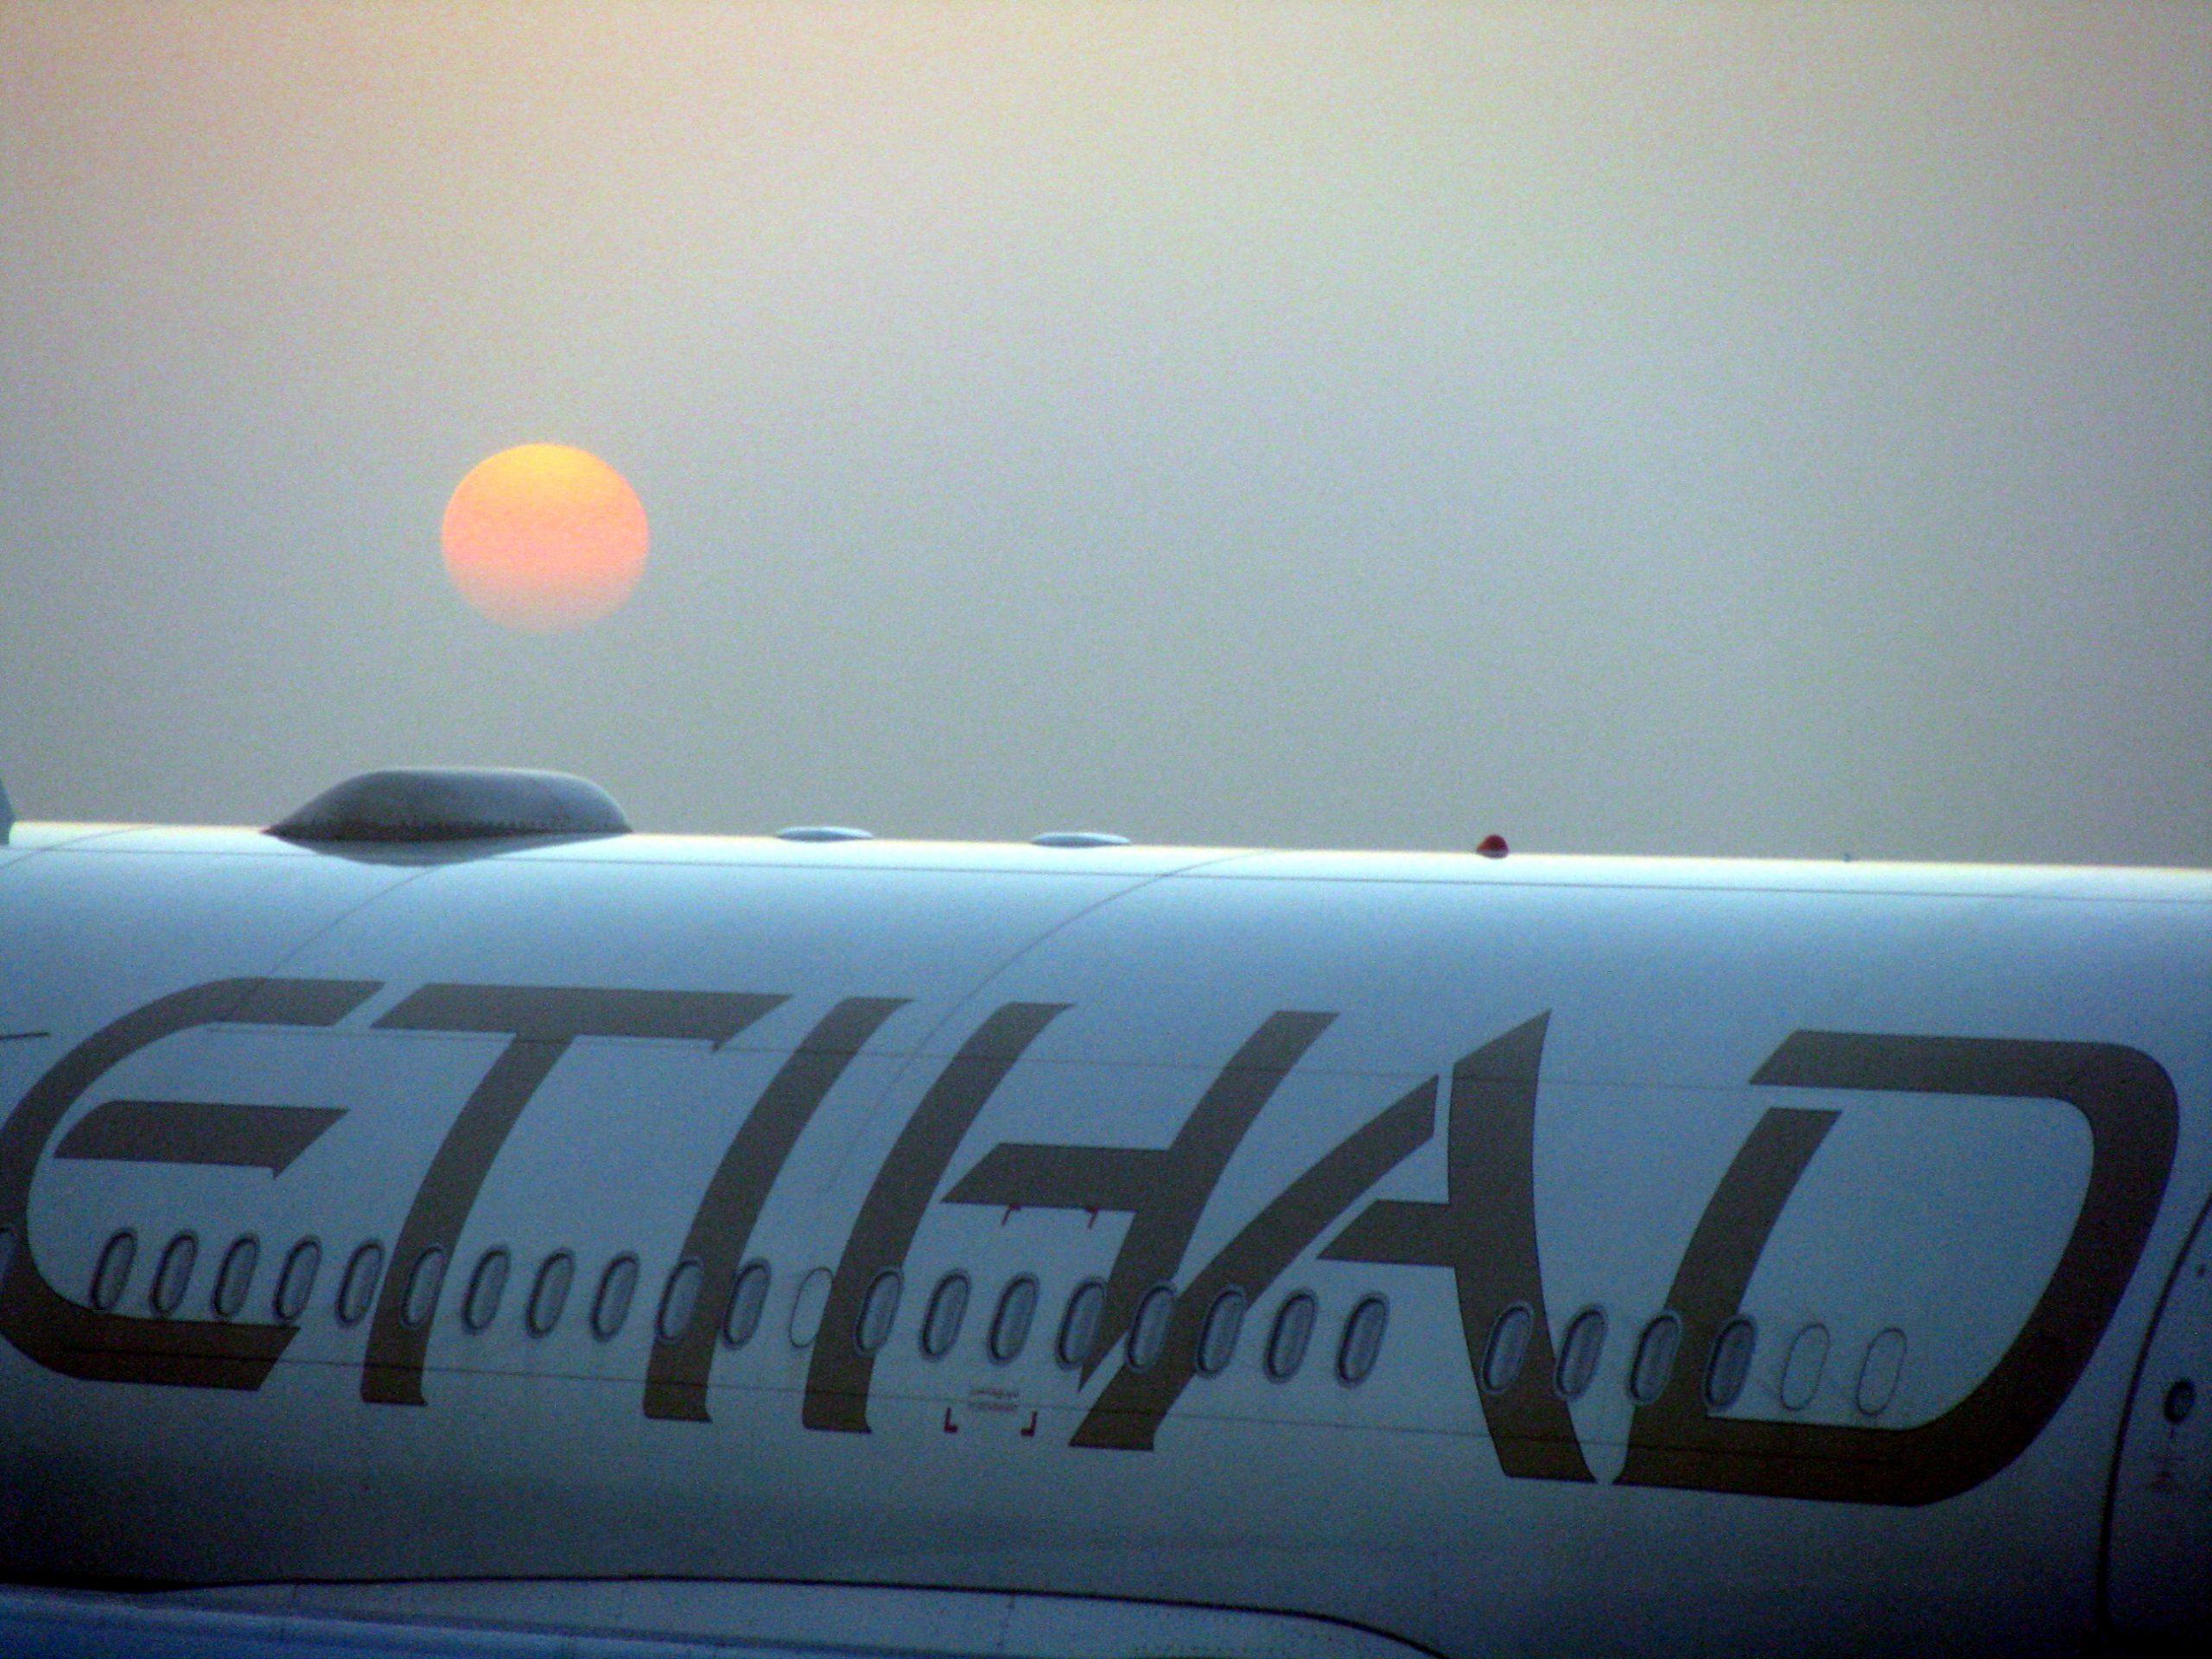 Een Etihad-vliegtuig (foto: Hasan Basri Akirmak)